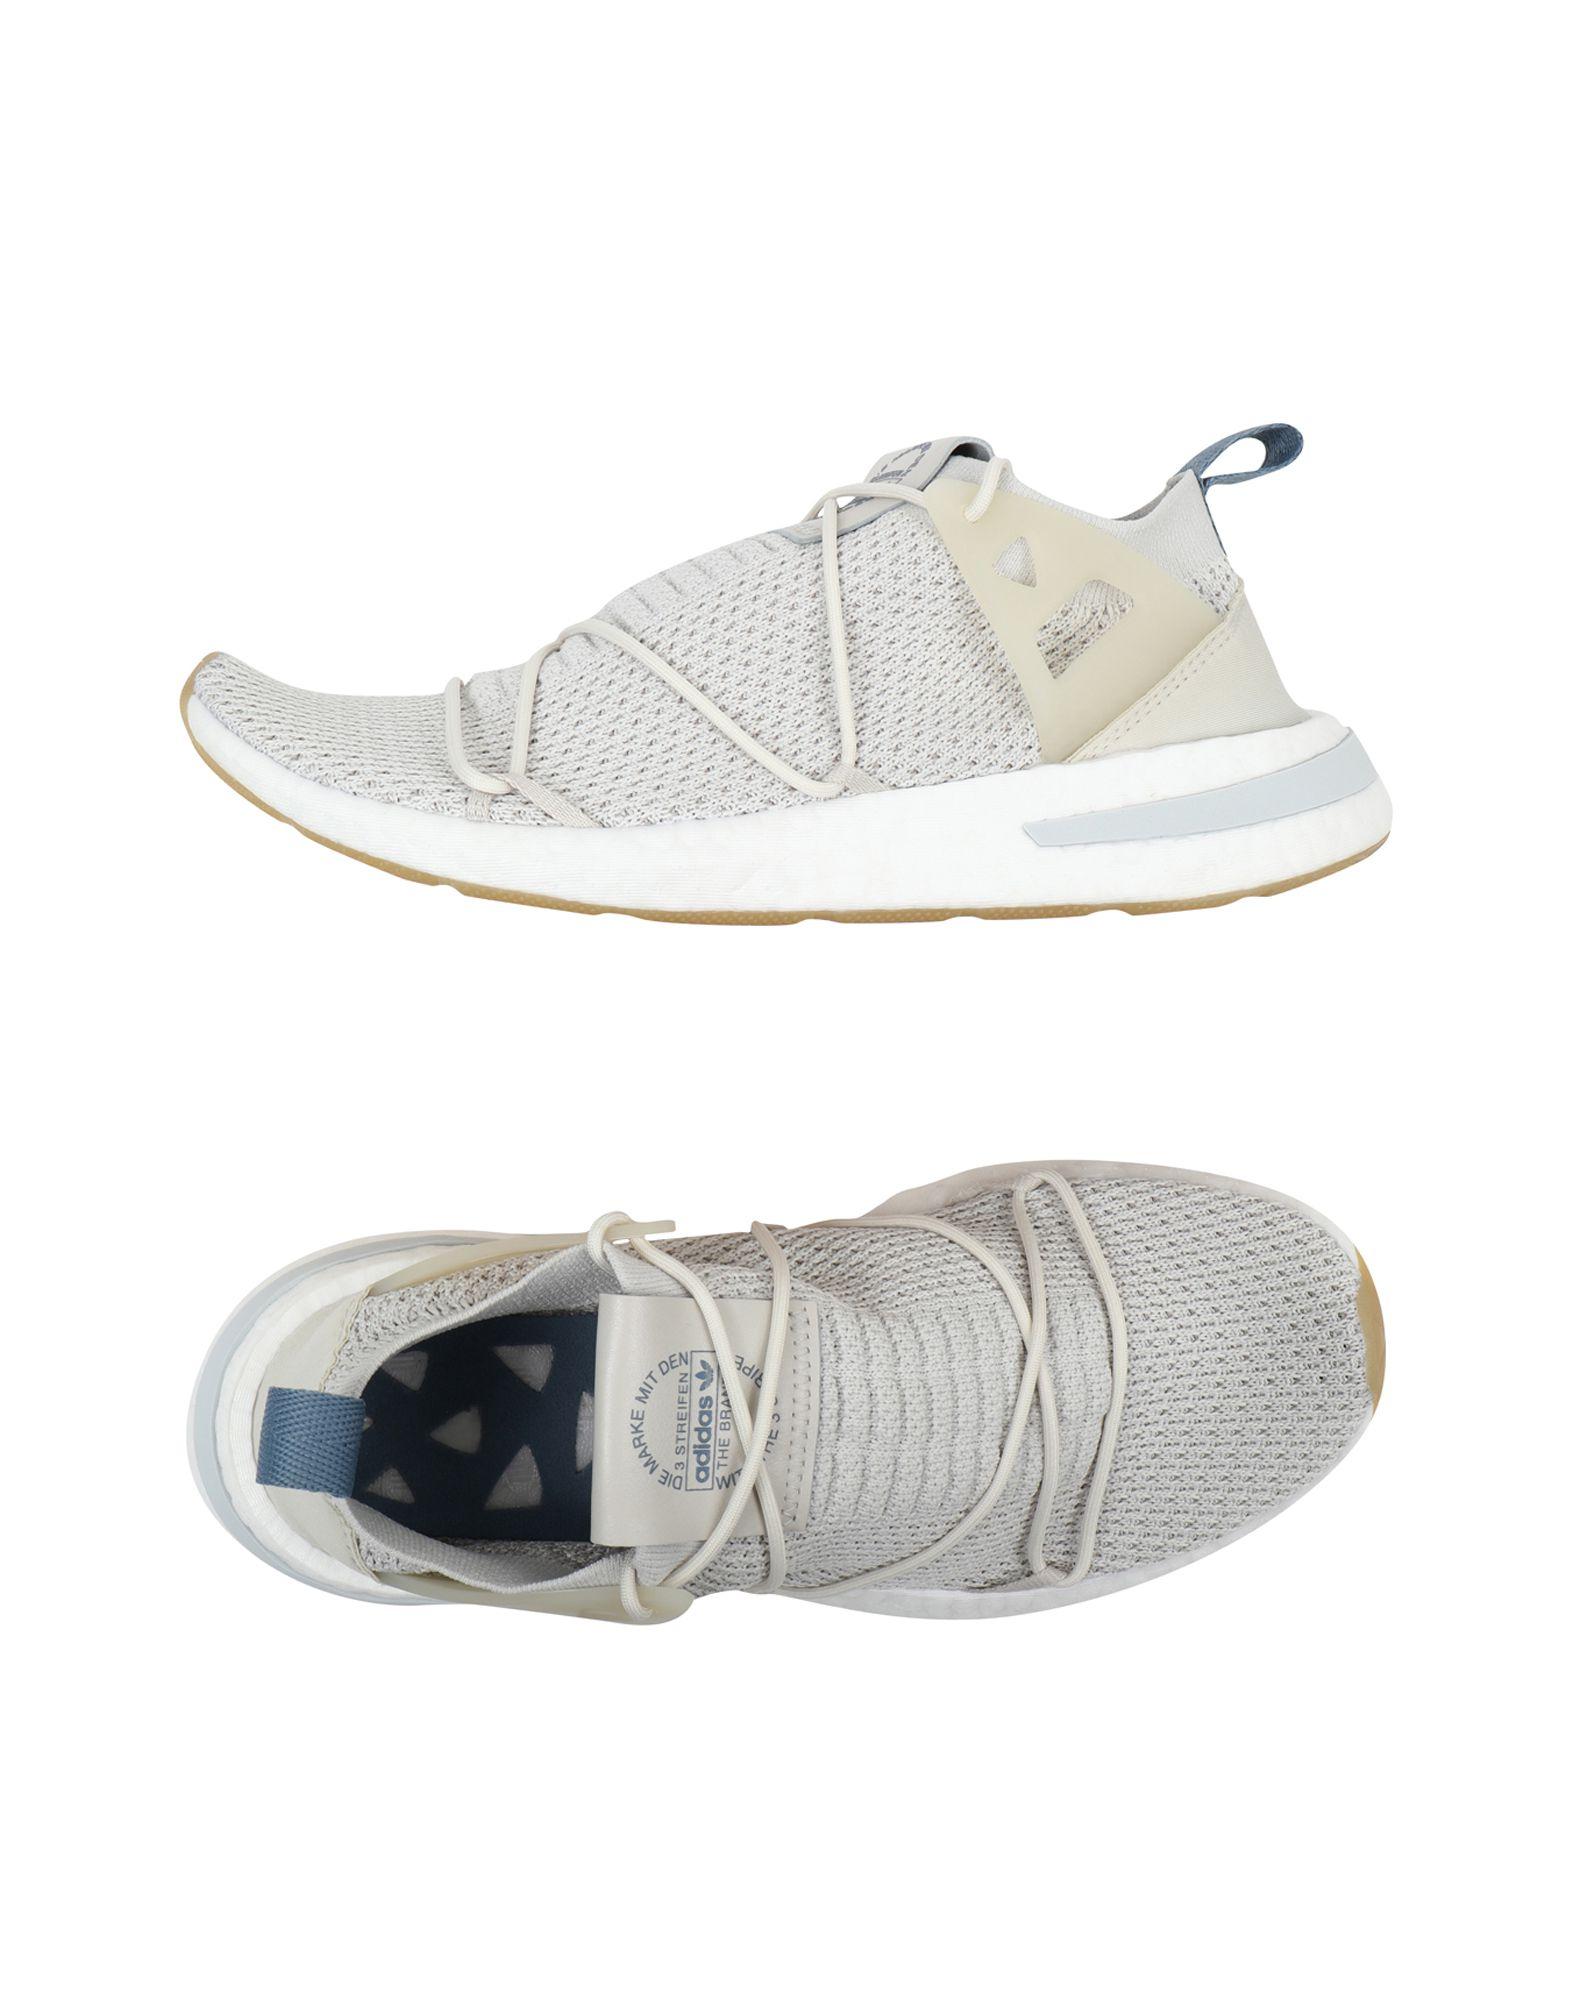 ADIDAS ORIGINALS ΠΑΠΟΥΤΣΙΑ Παπούτσια τένις χαμηλά 14972a2c855